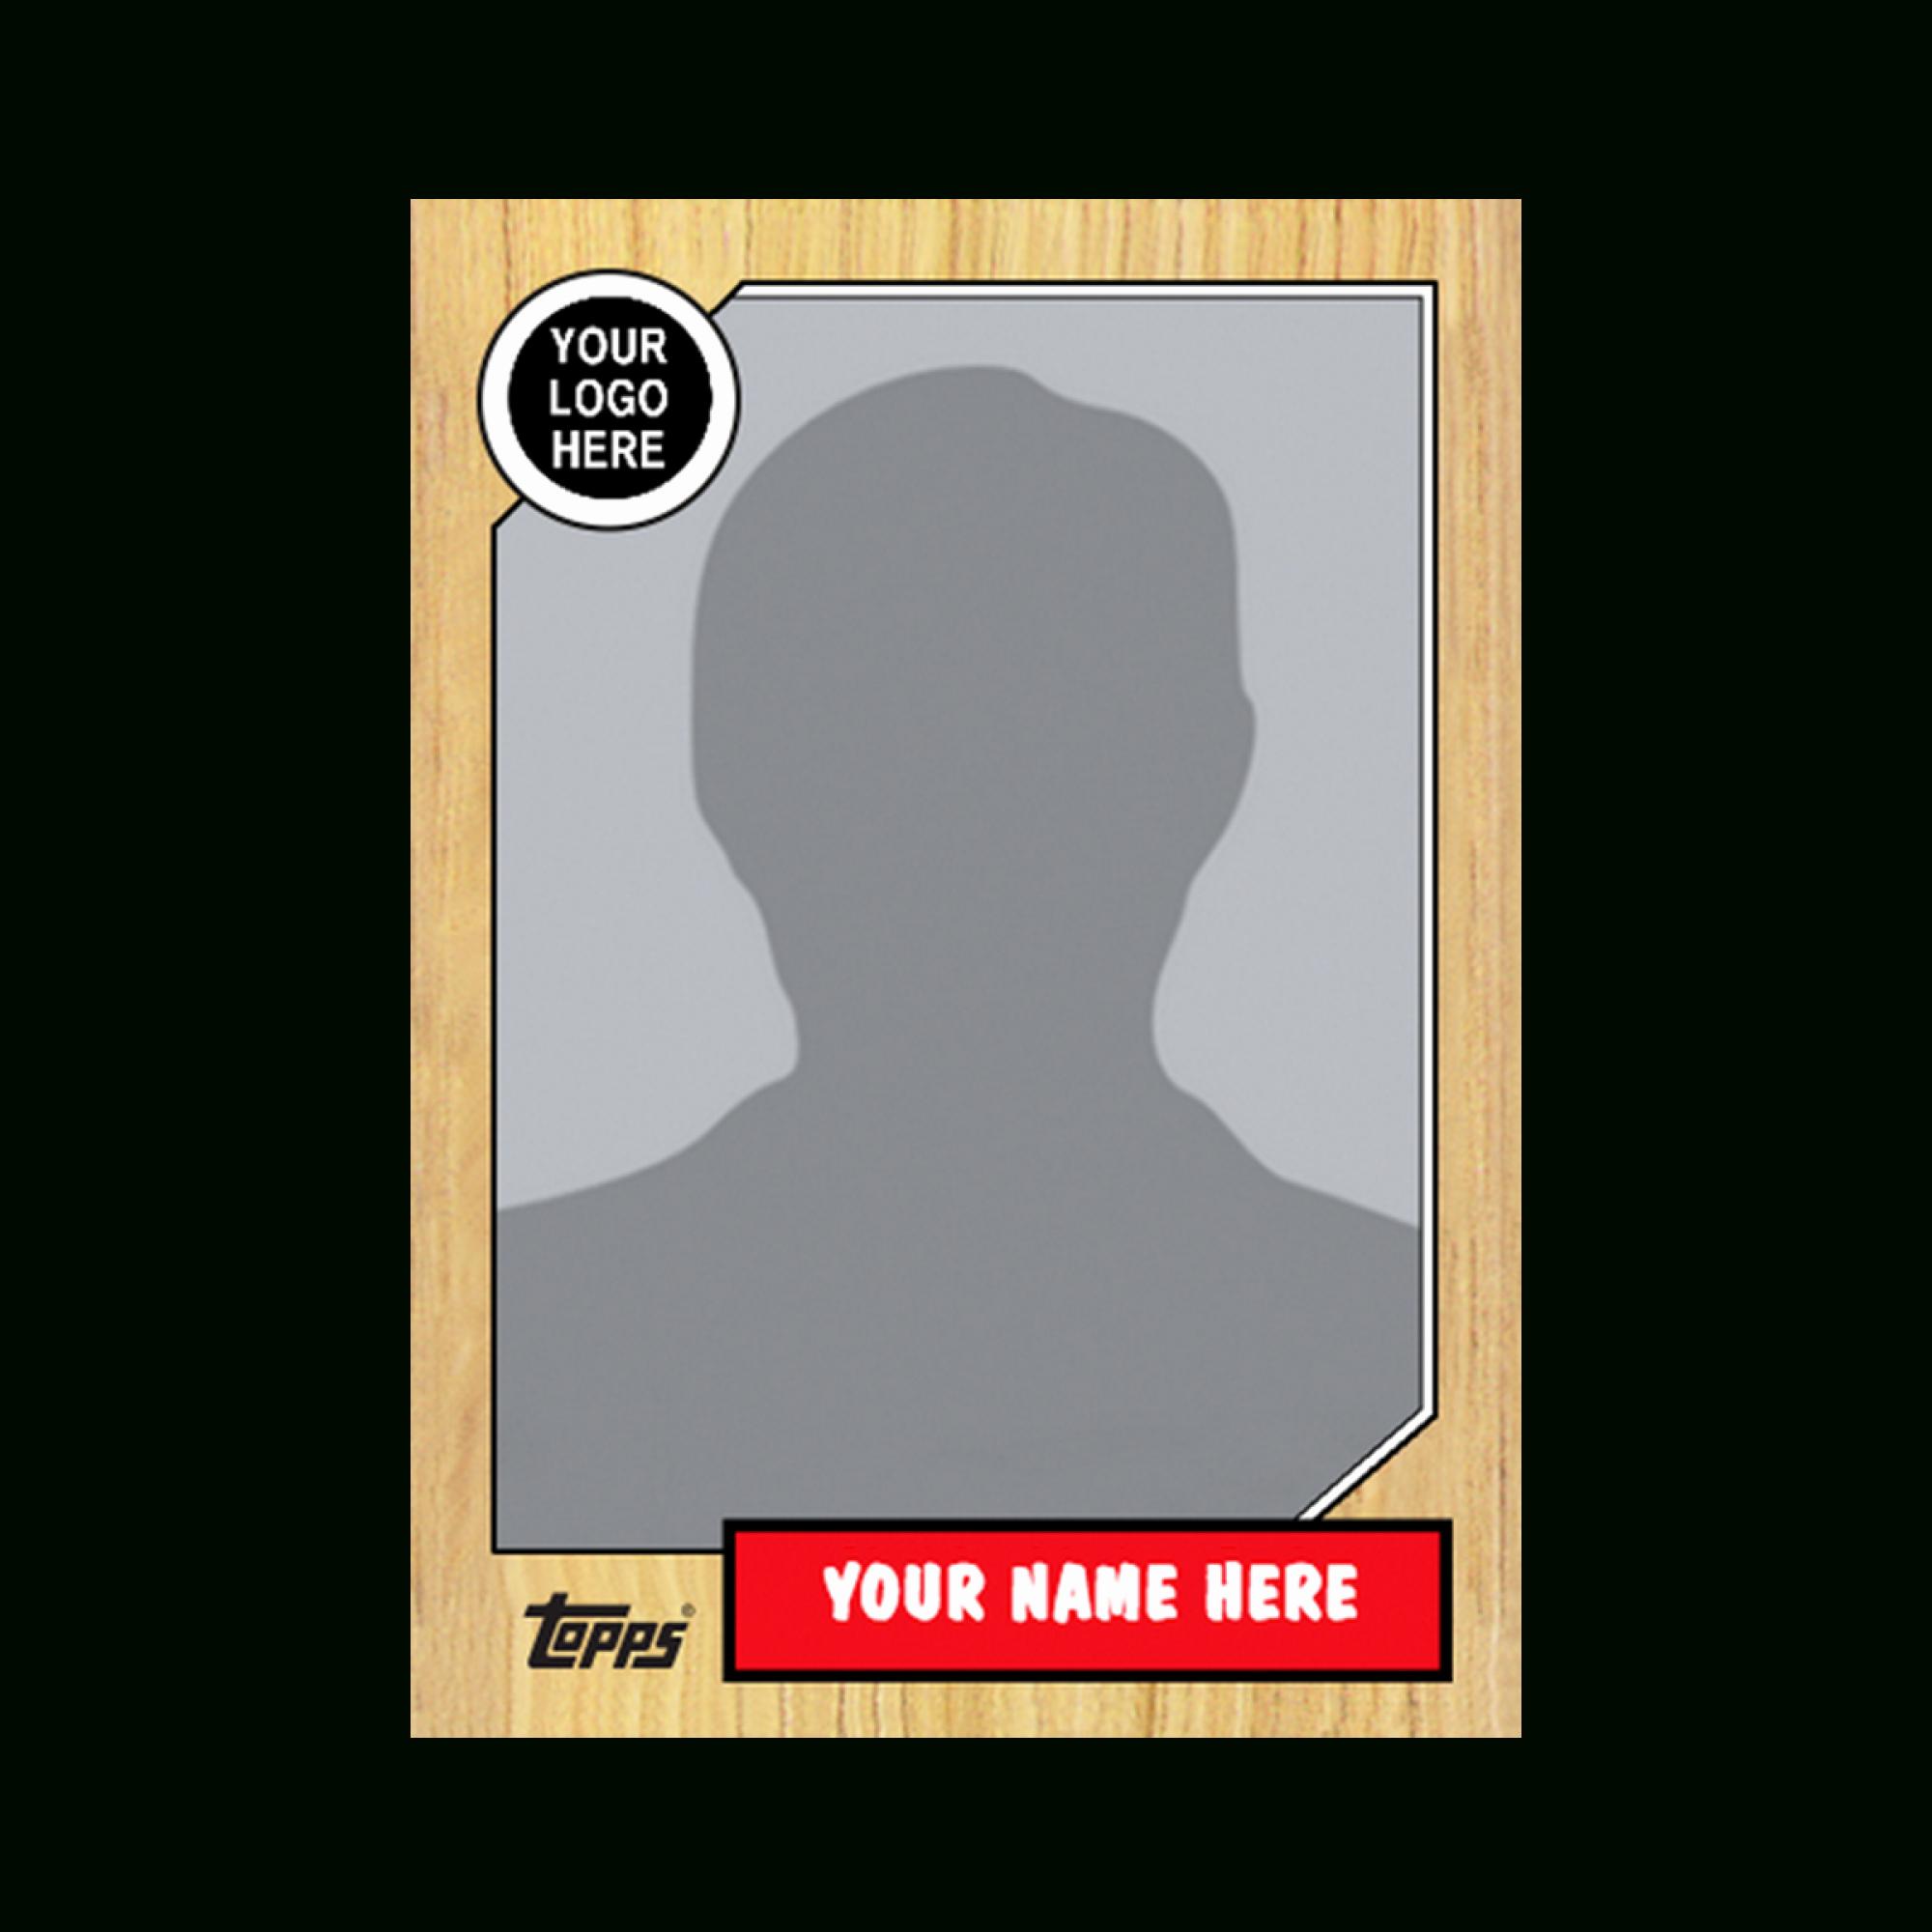 Topps Baseball Card Template New Baseball Card Template